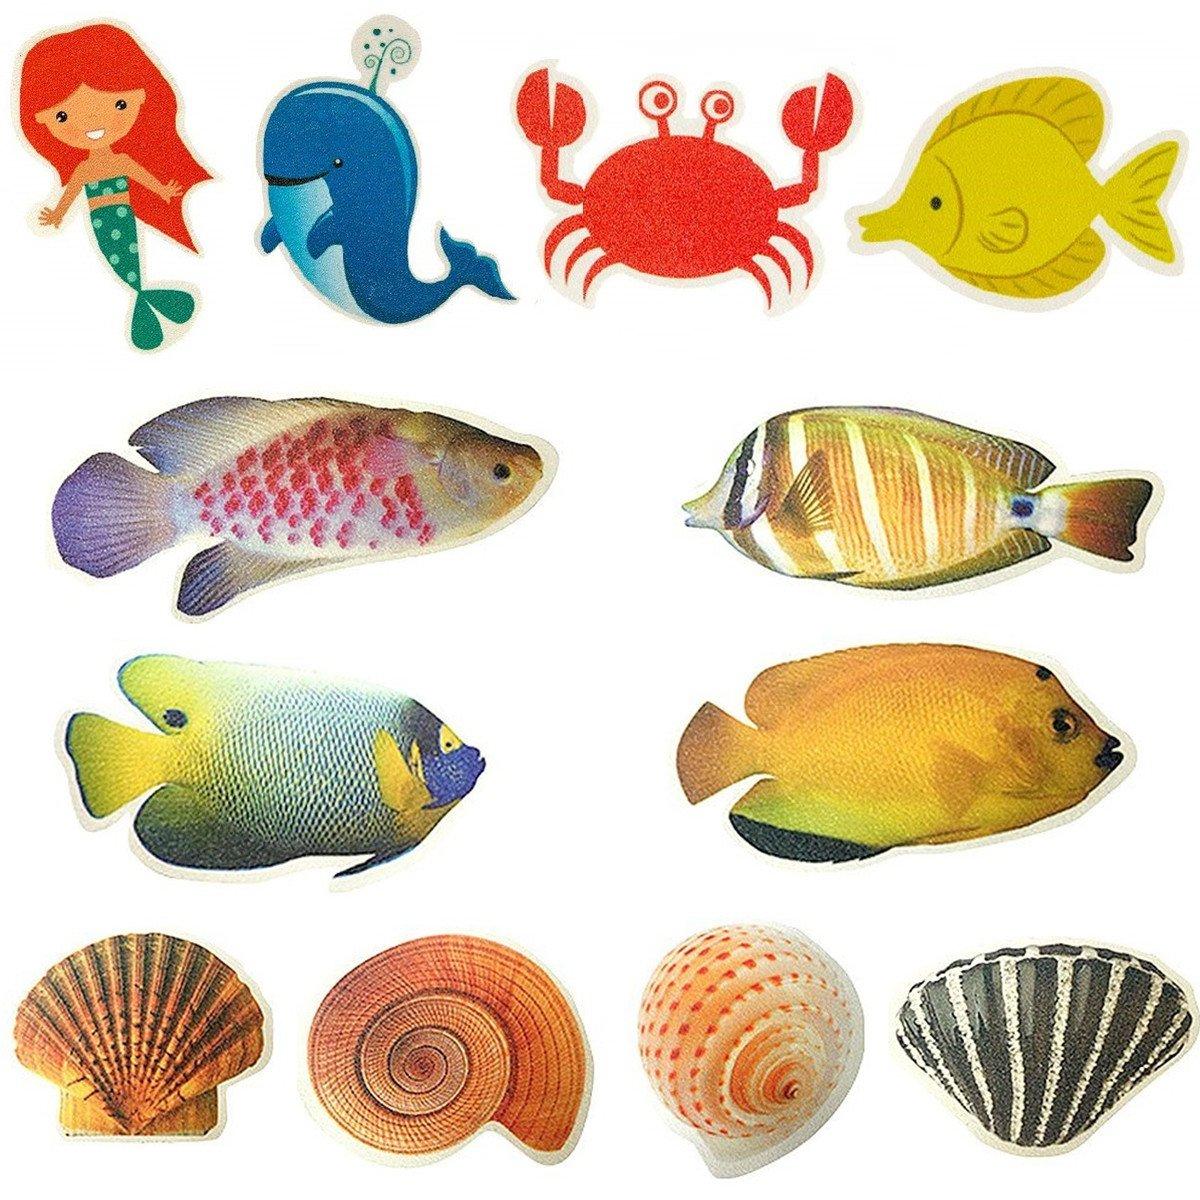 SINDBIN 12 PCS Non-Slip Bathtub Stickers, Sea Creature Seashell Fish Adhesive Bath Treads Anti-Slip Applique for Bath Tubs and Showers